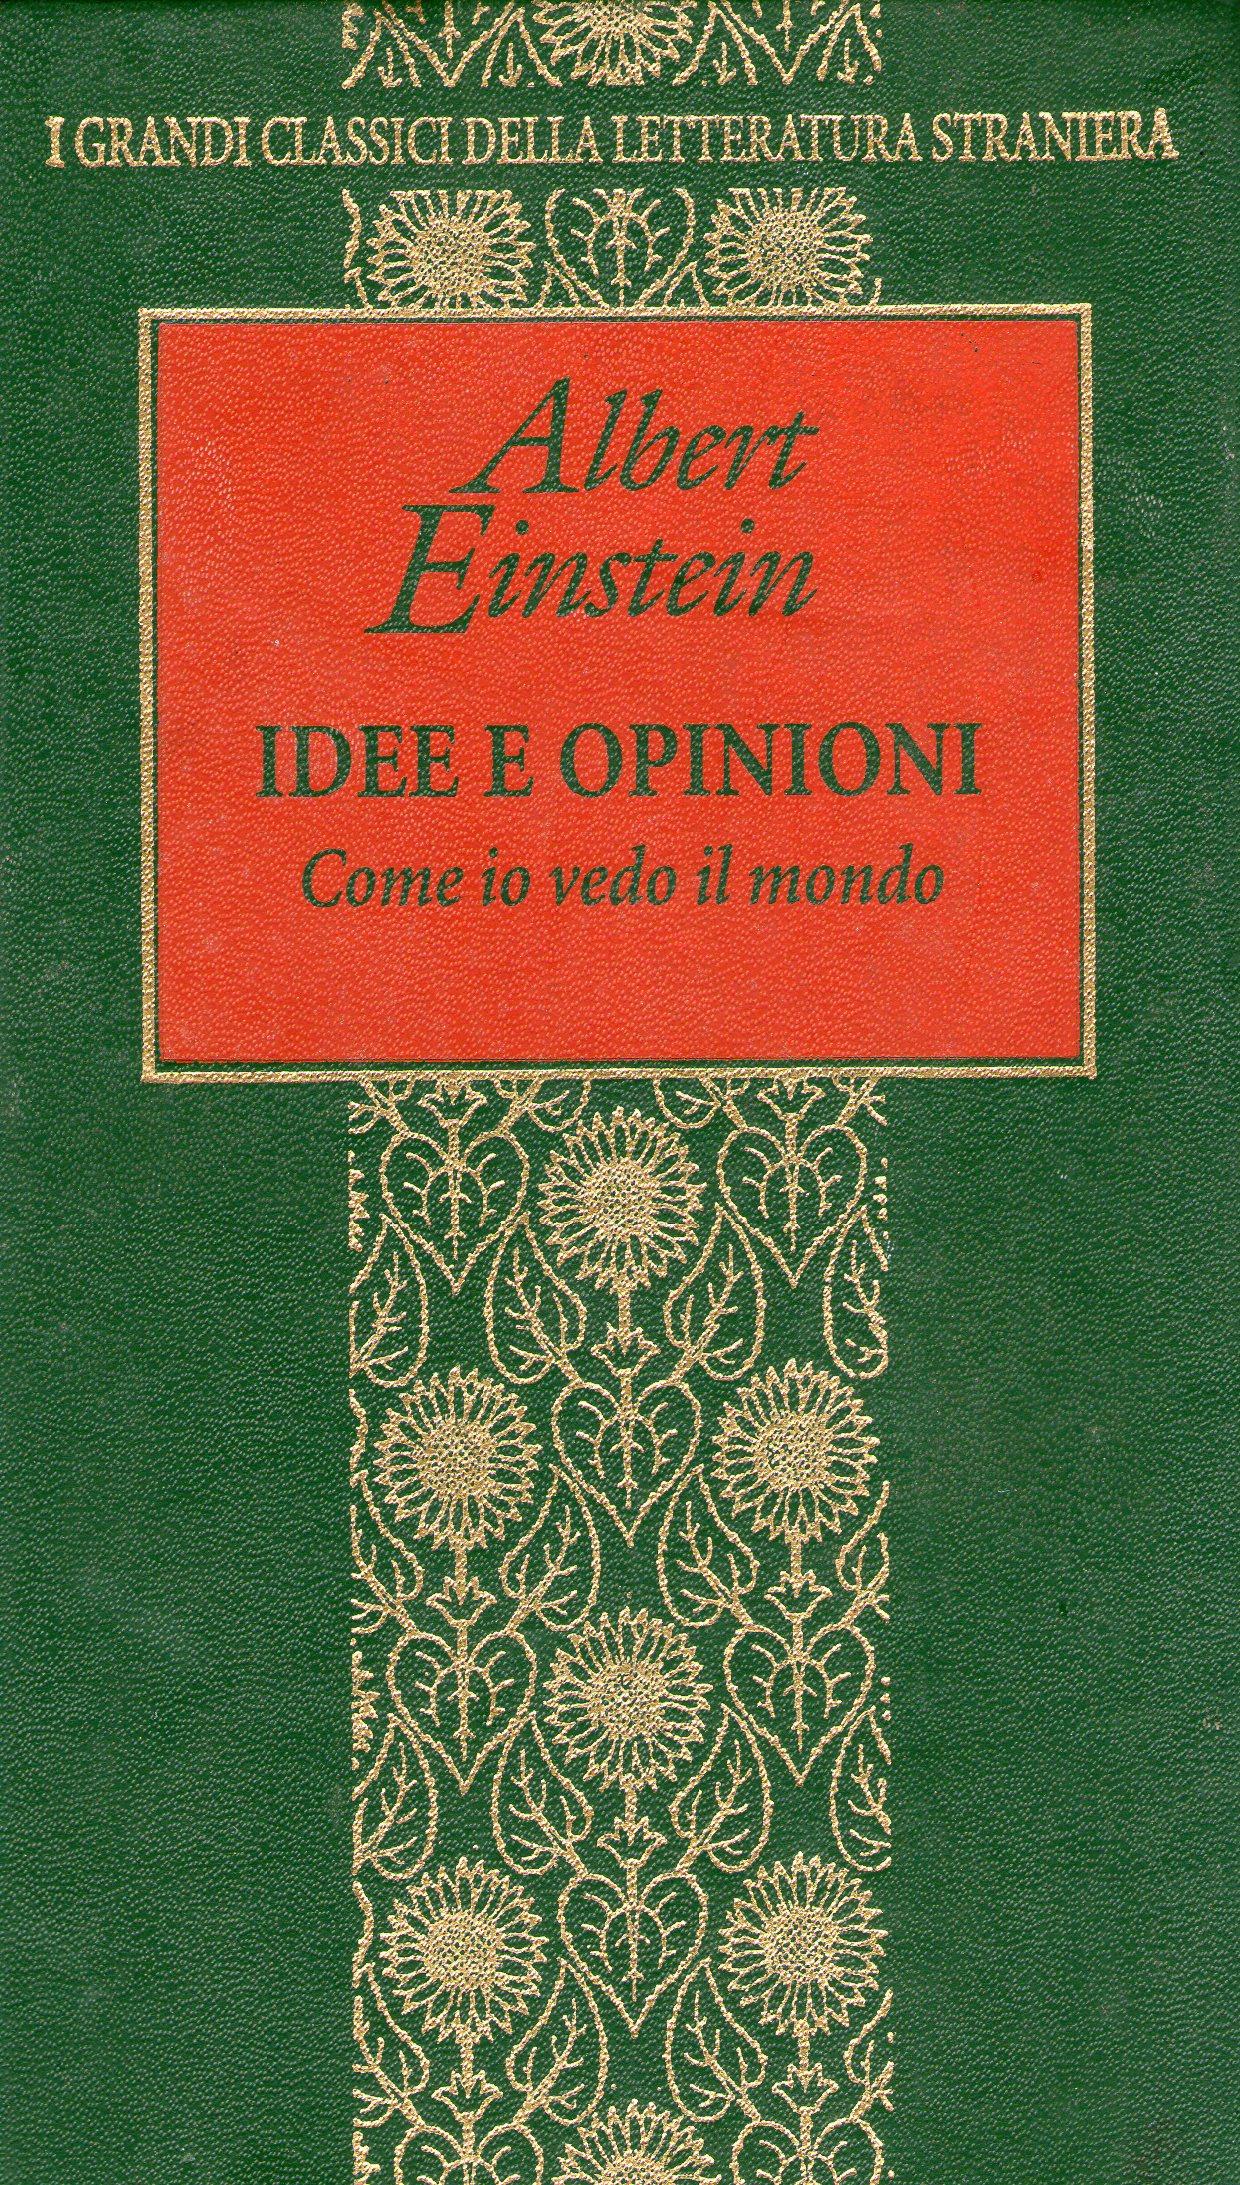 Idee e opinioni